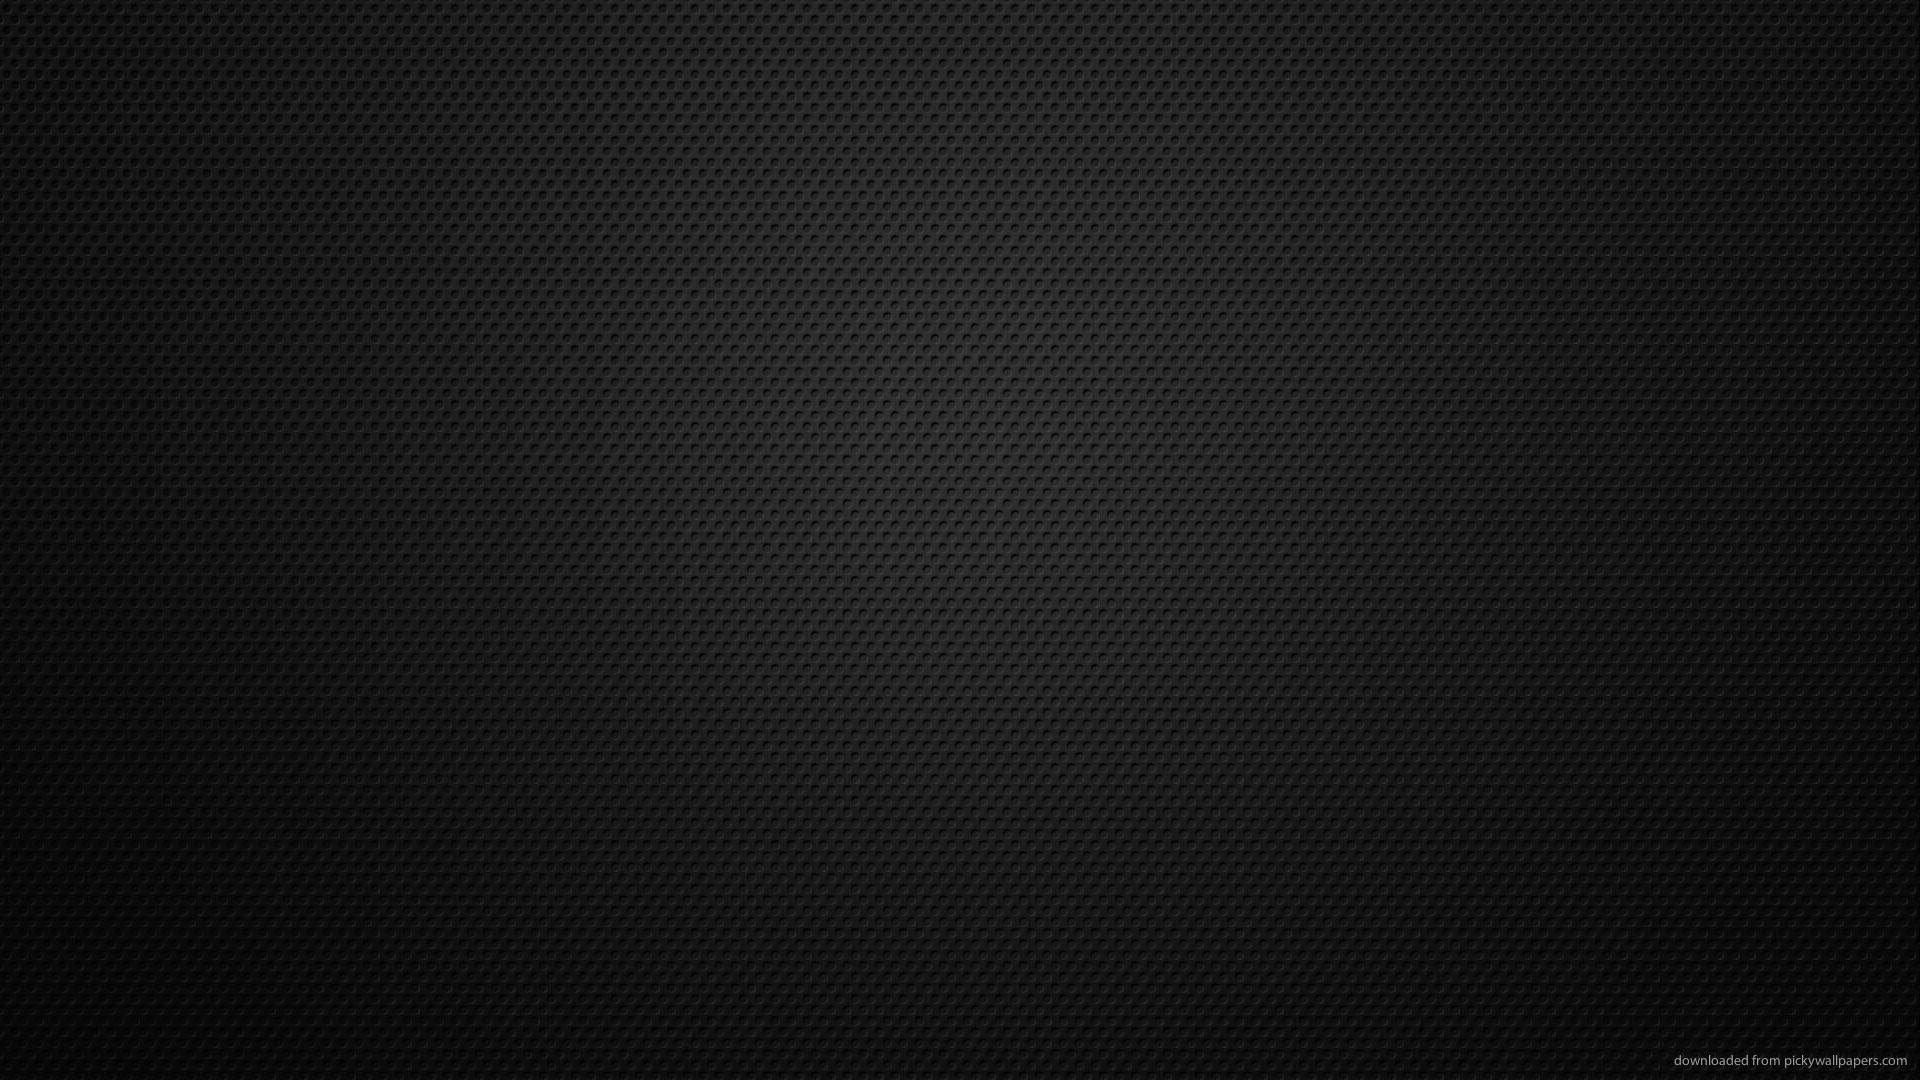 Black Hd Wallpaper 12 Desktop Wallpaper